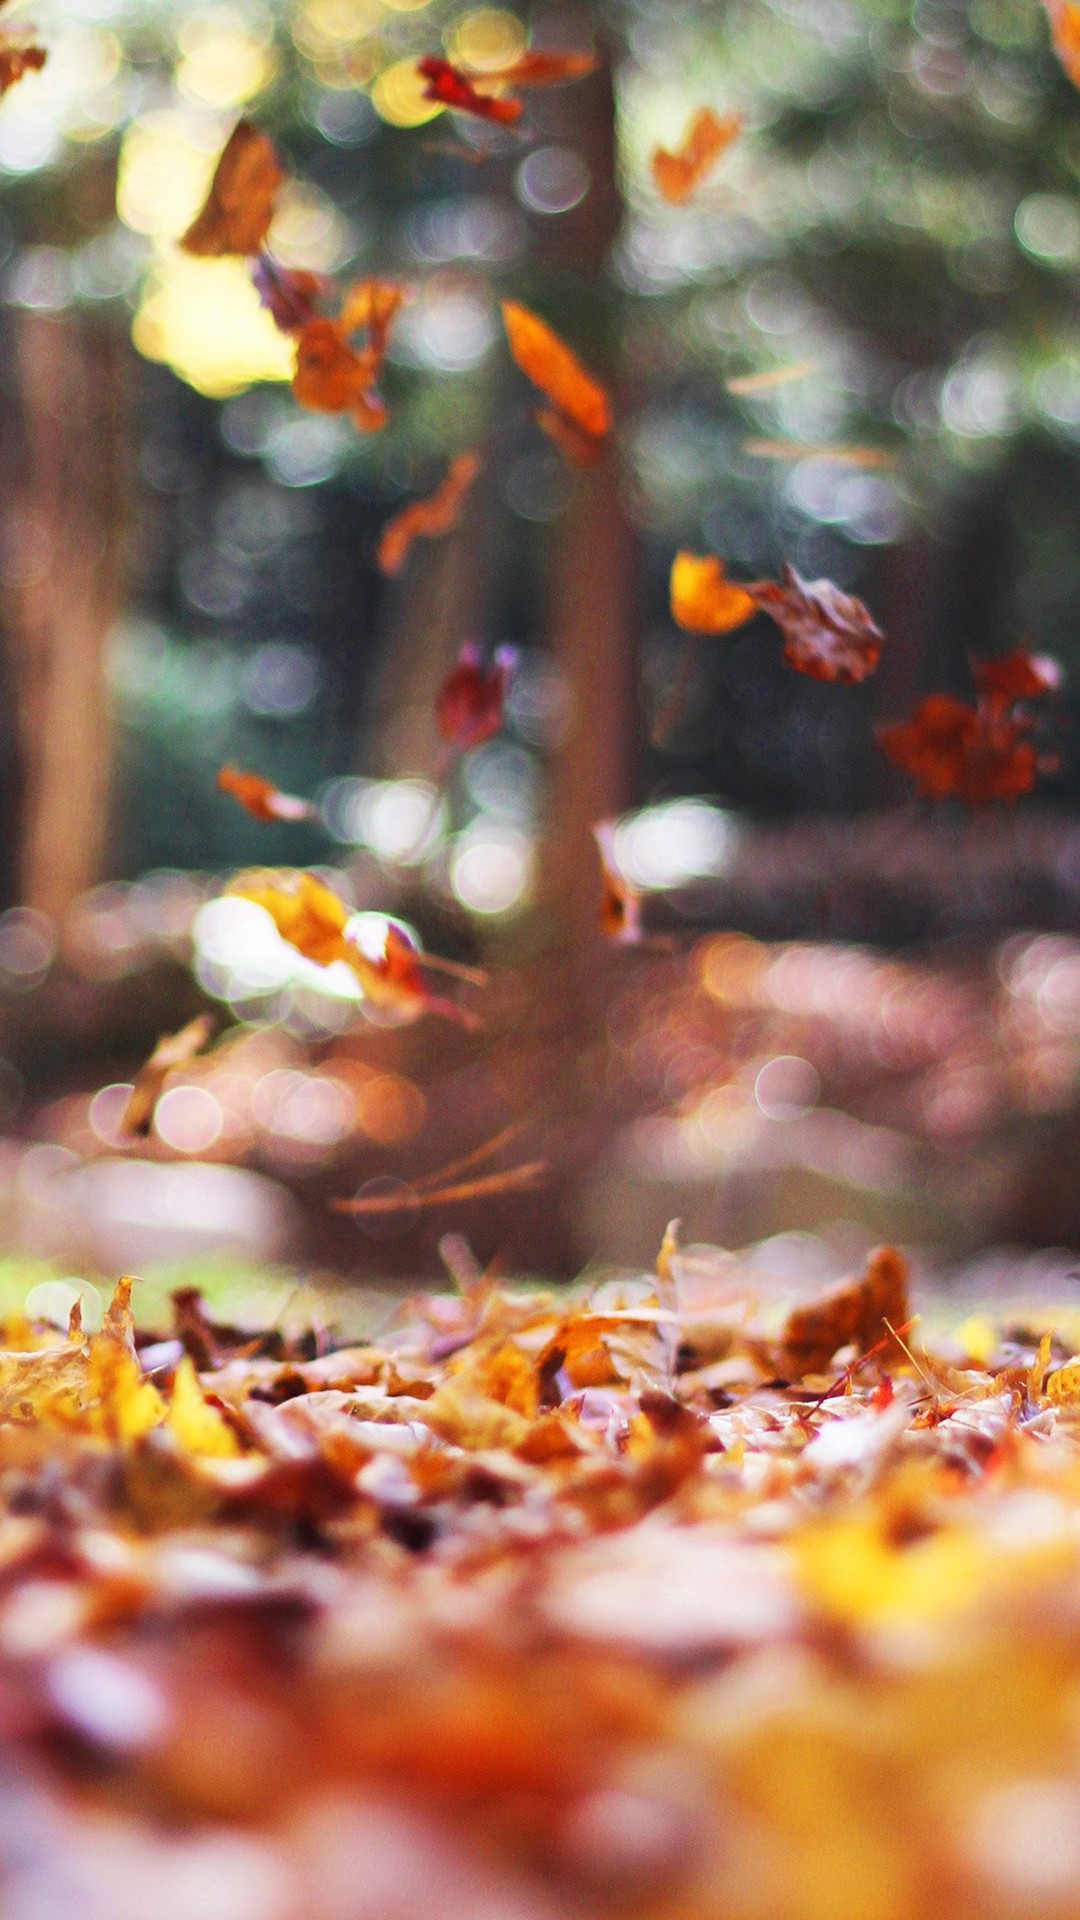 Fall Leaves Nature Tree Year Sad iPhone 6 wallpaper